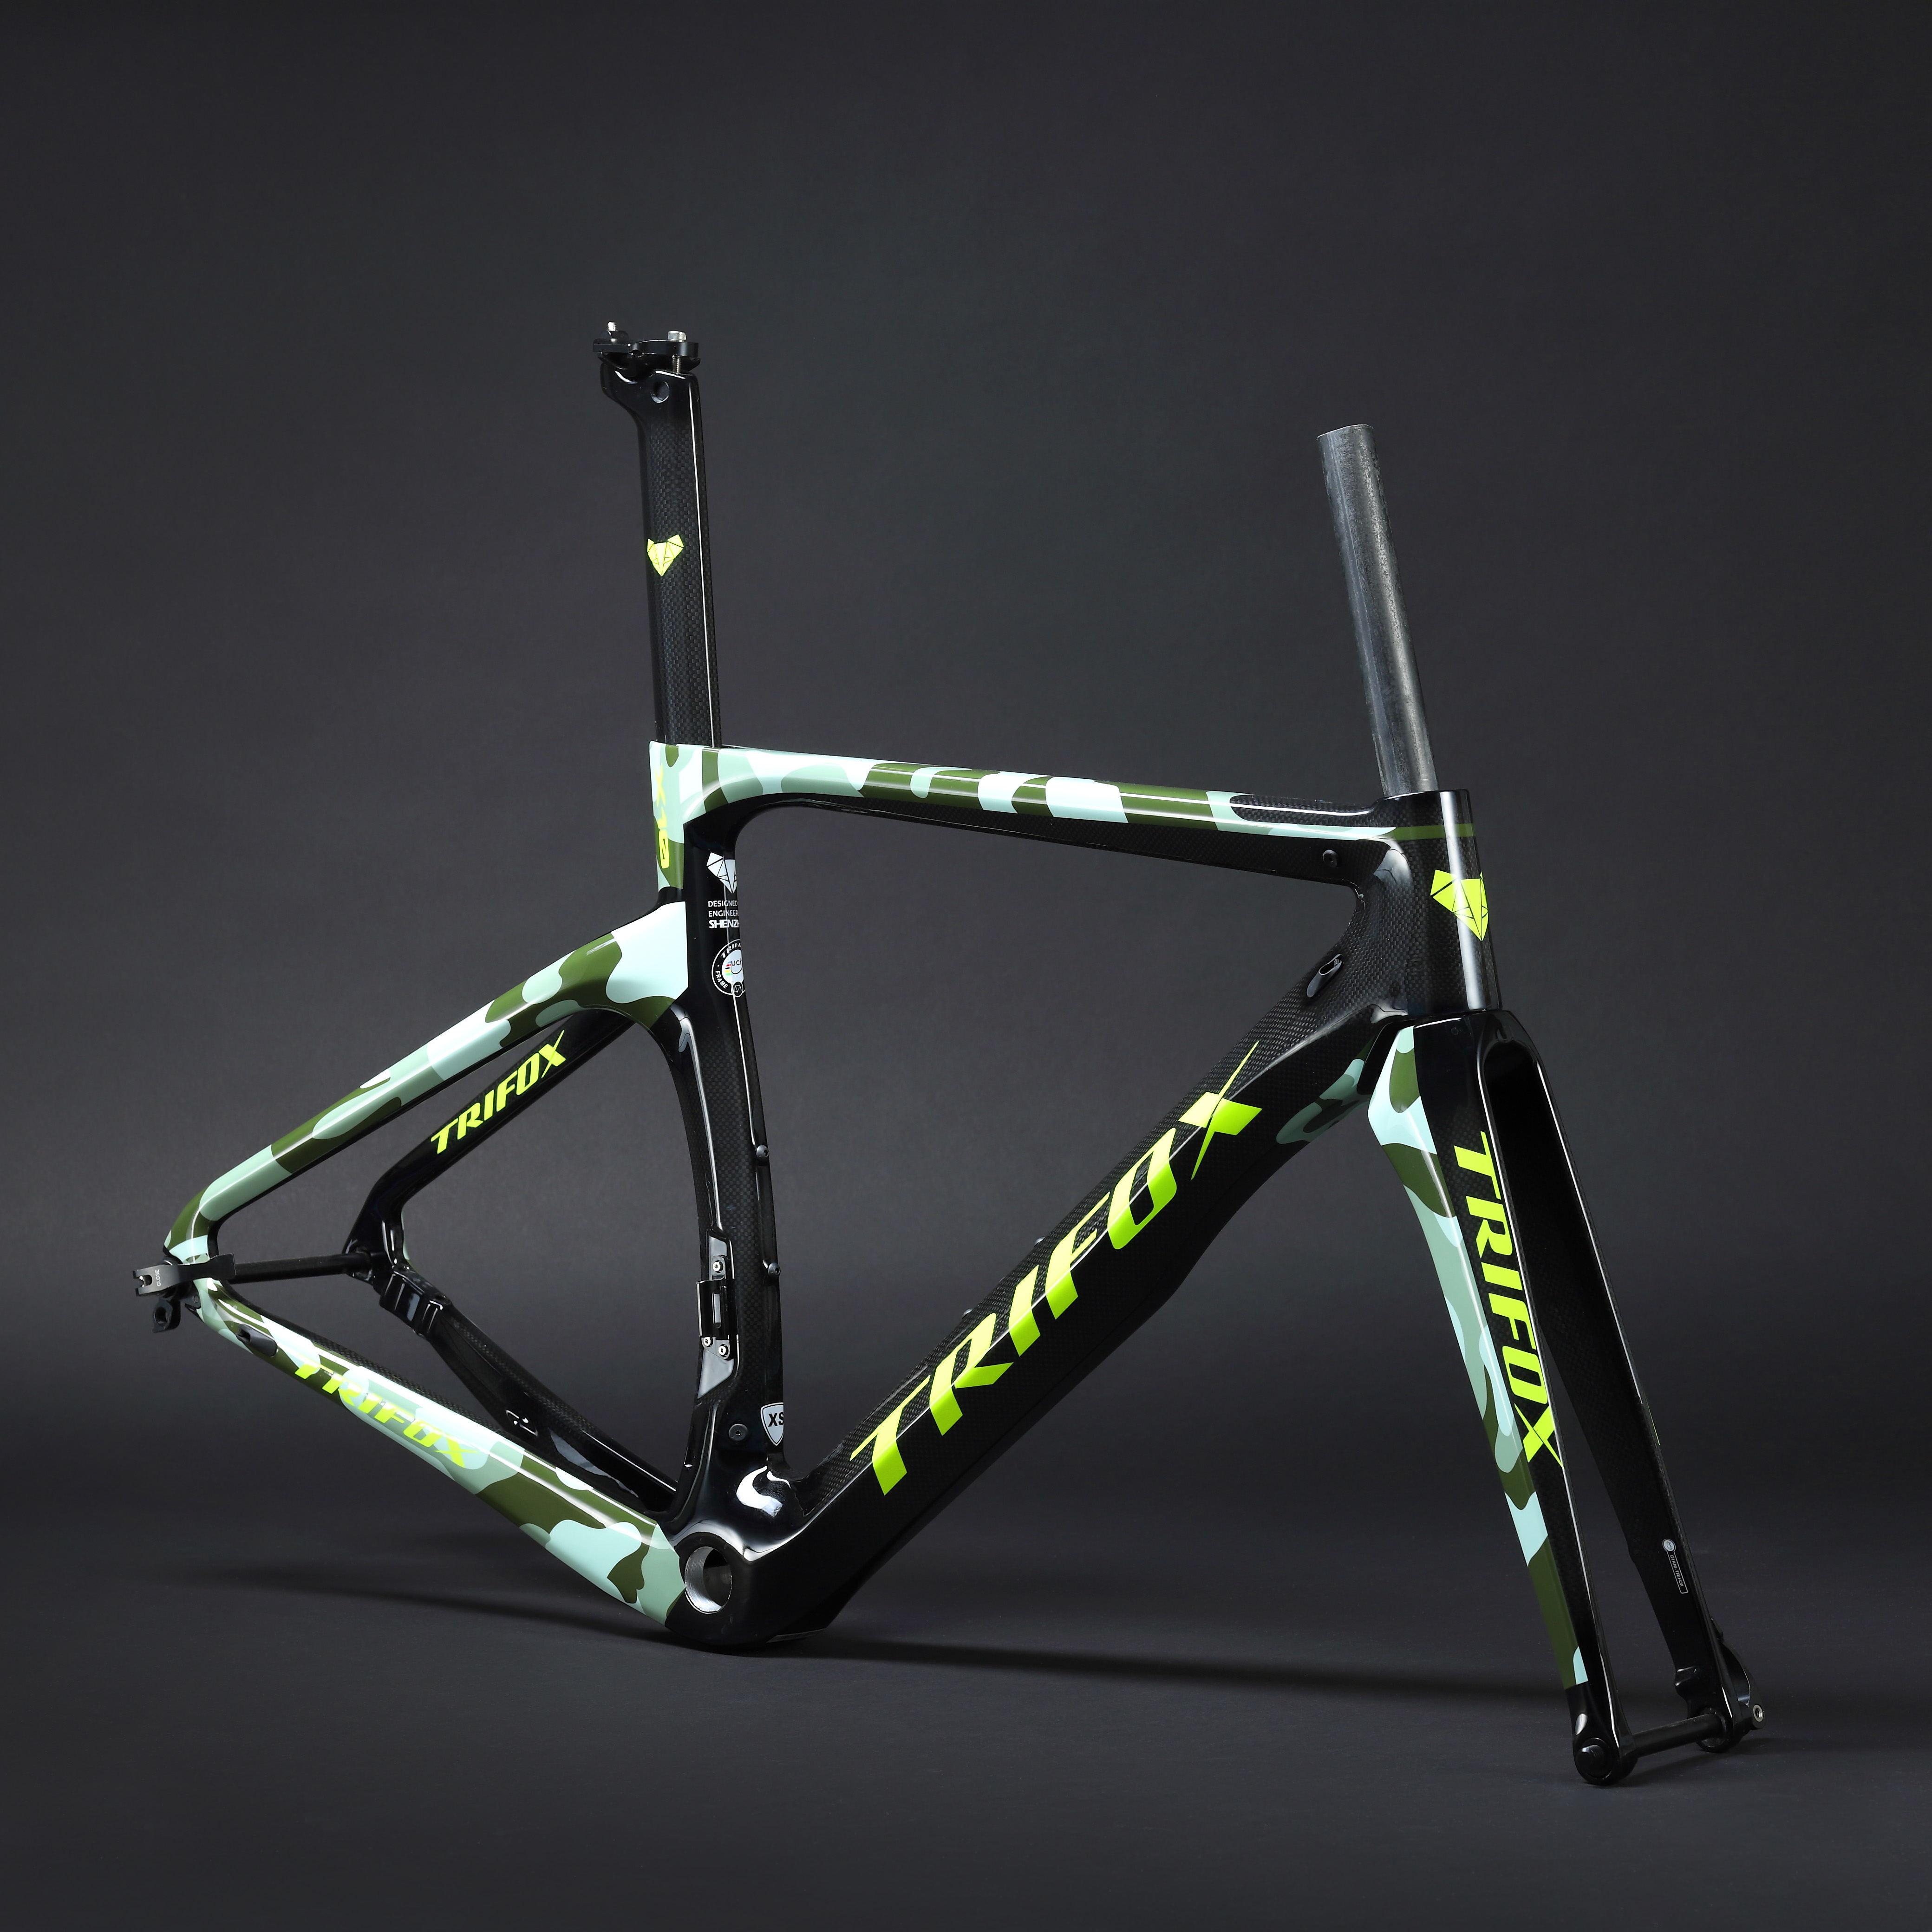 TRIFOX Carbon Road Bike Frame Disc Brakes Di2 Mechanical 3K  Carbon Fibre Road Cycling Super Light Race Bicycle Frameset Bike